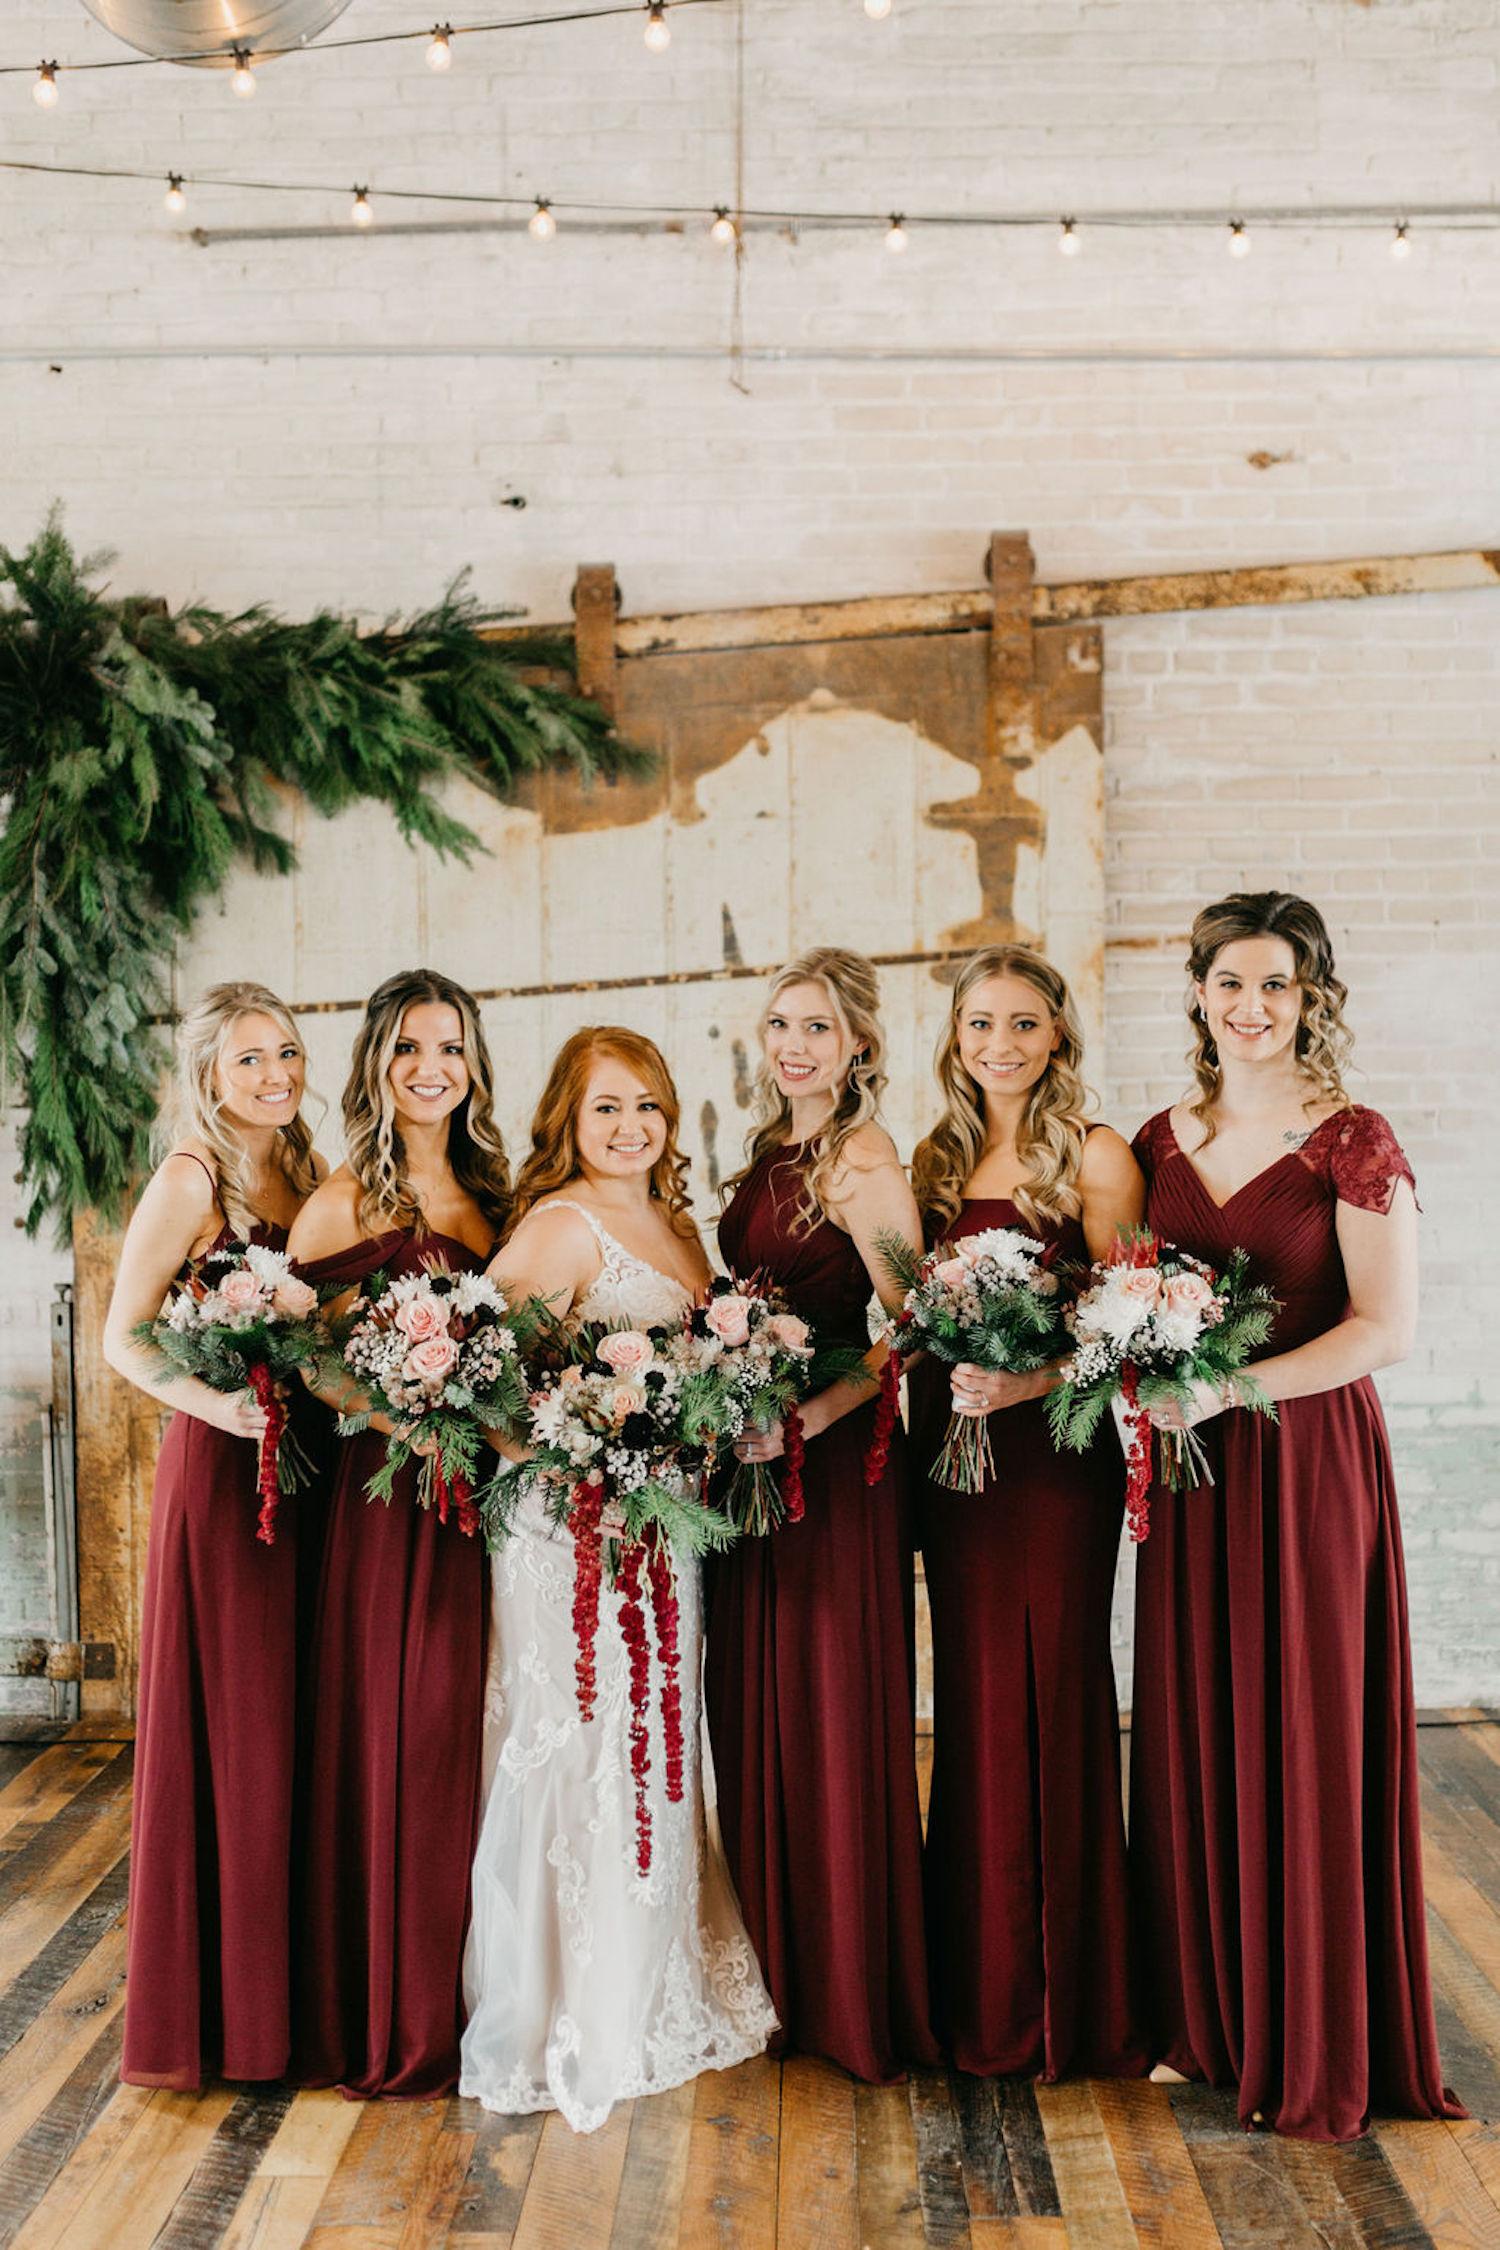 Bride and bridesmaids standing at Journeyman Distillery wedding